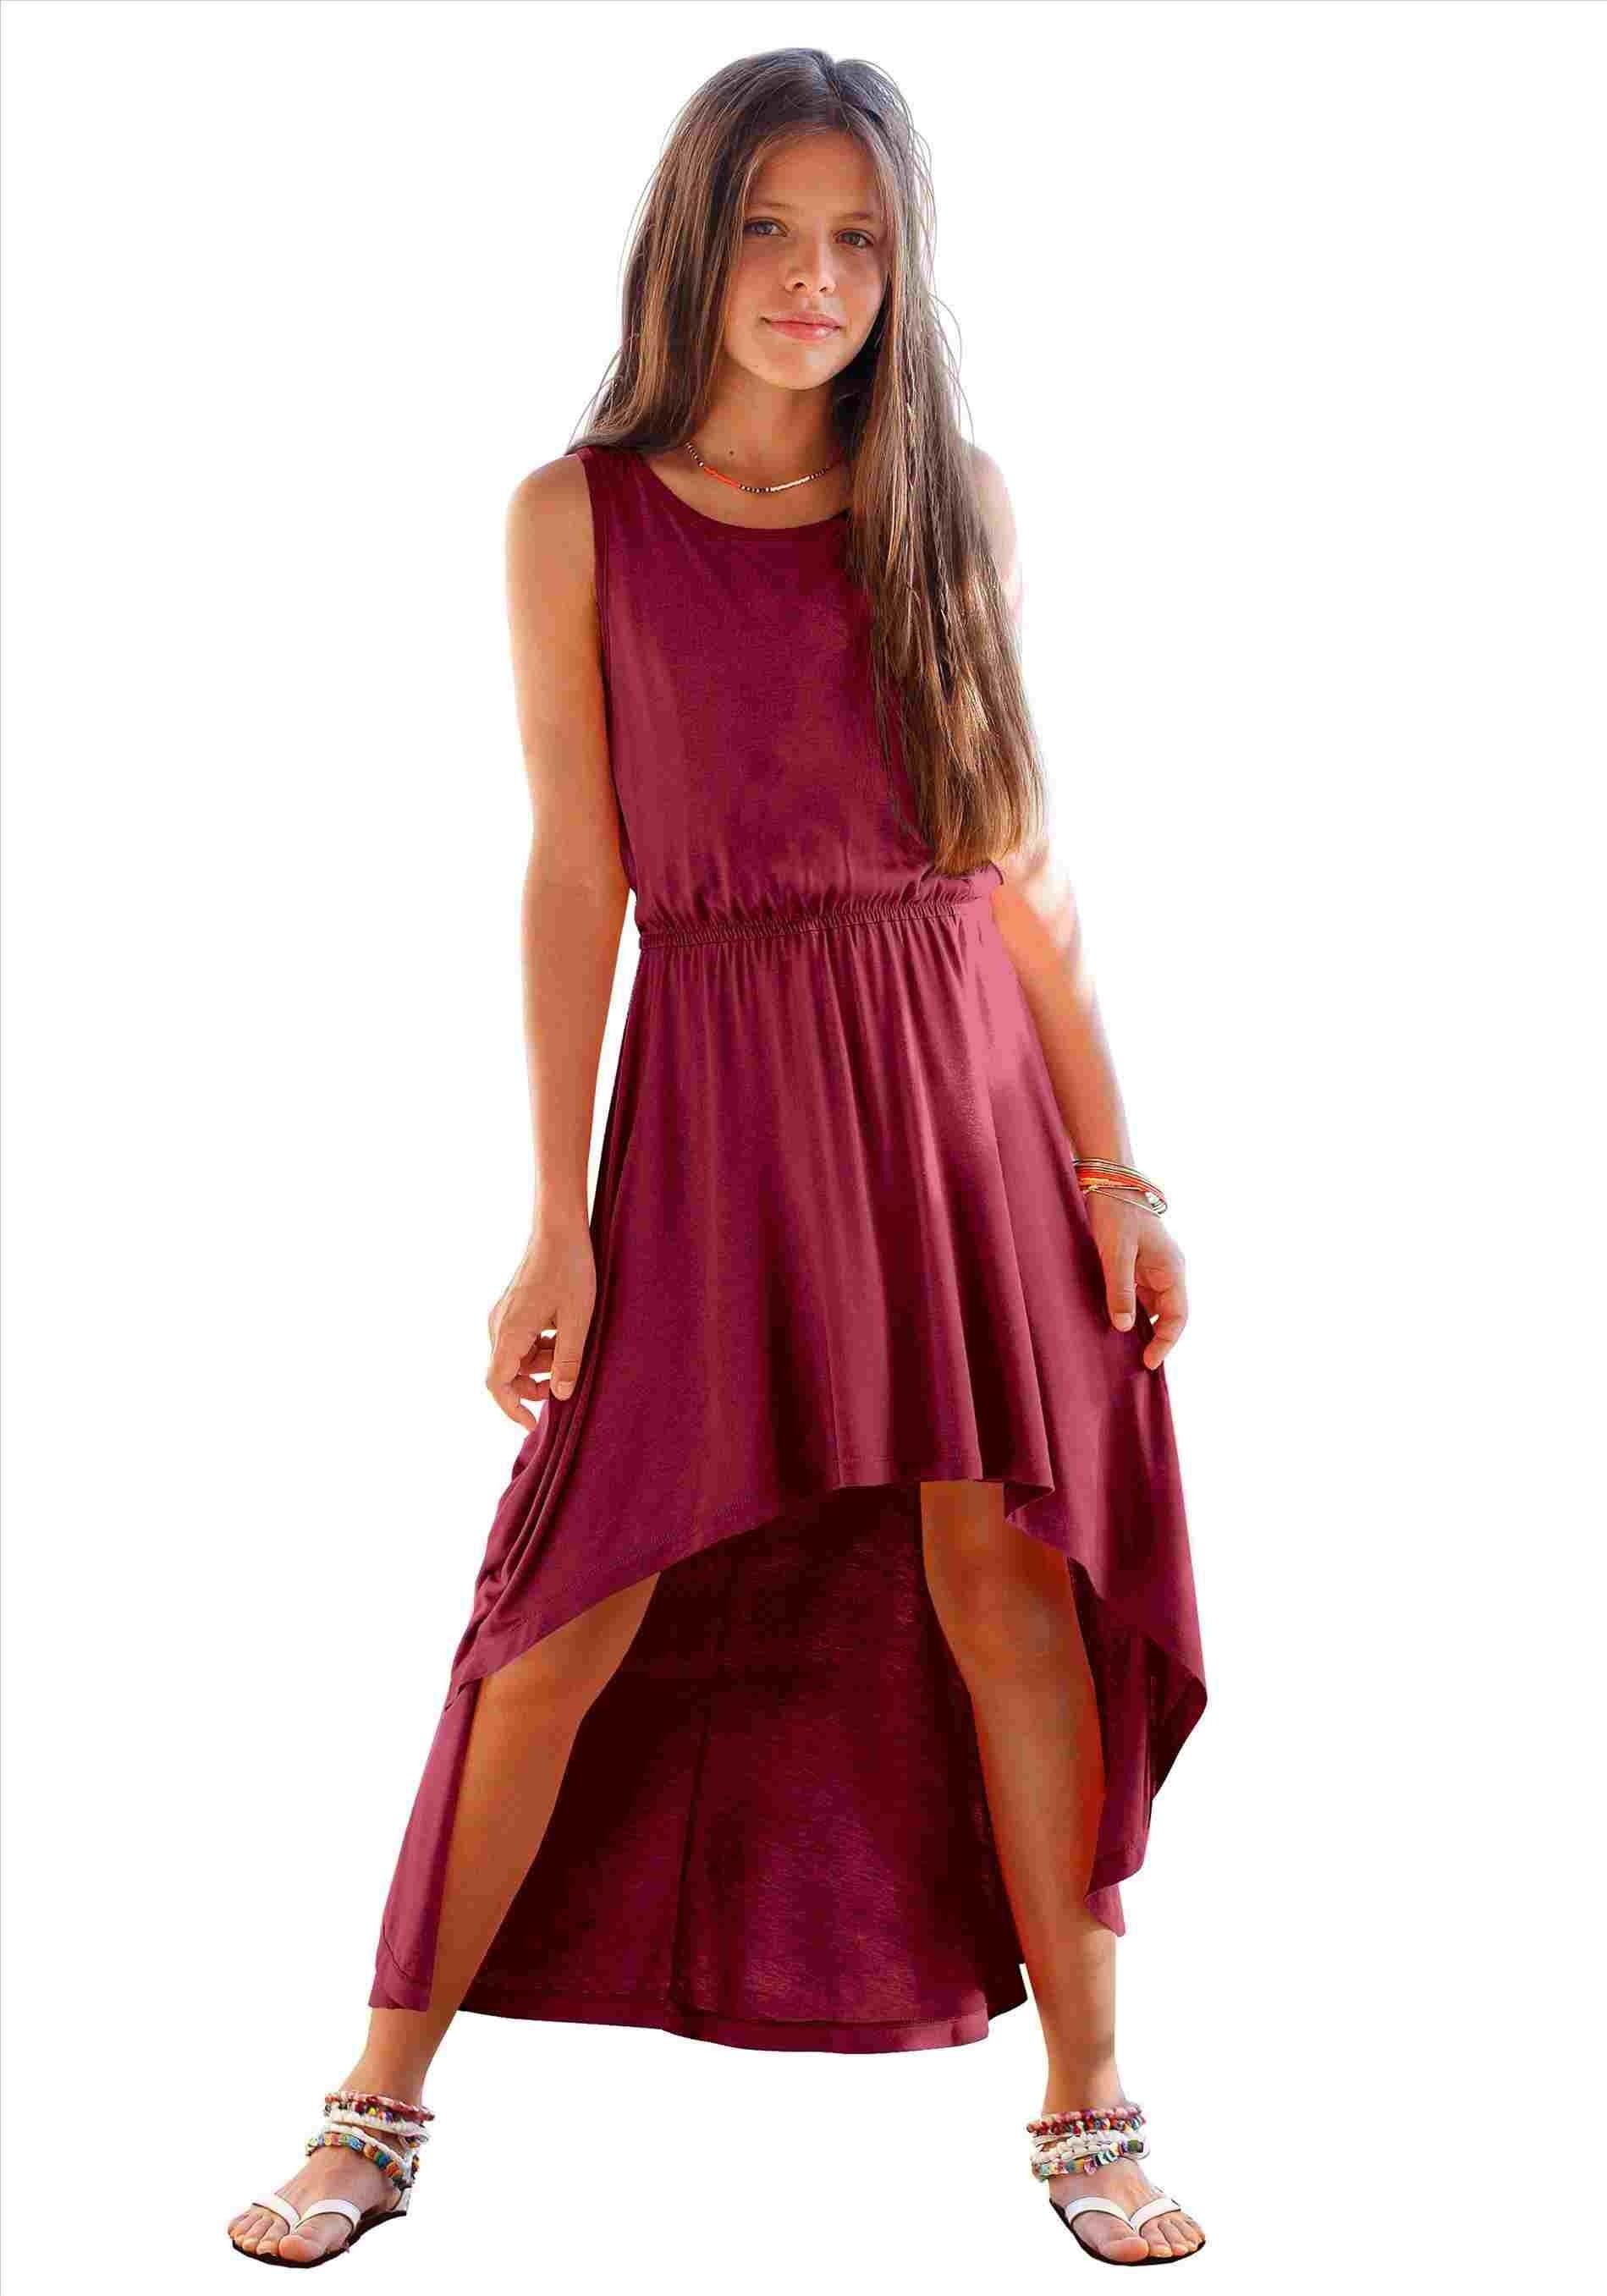 10 Genial Elegante Kleider Größe 40 Bester Preis10 Fantastisch Elegante Kleider Größe 40 für 2019